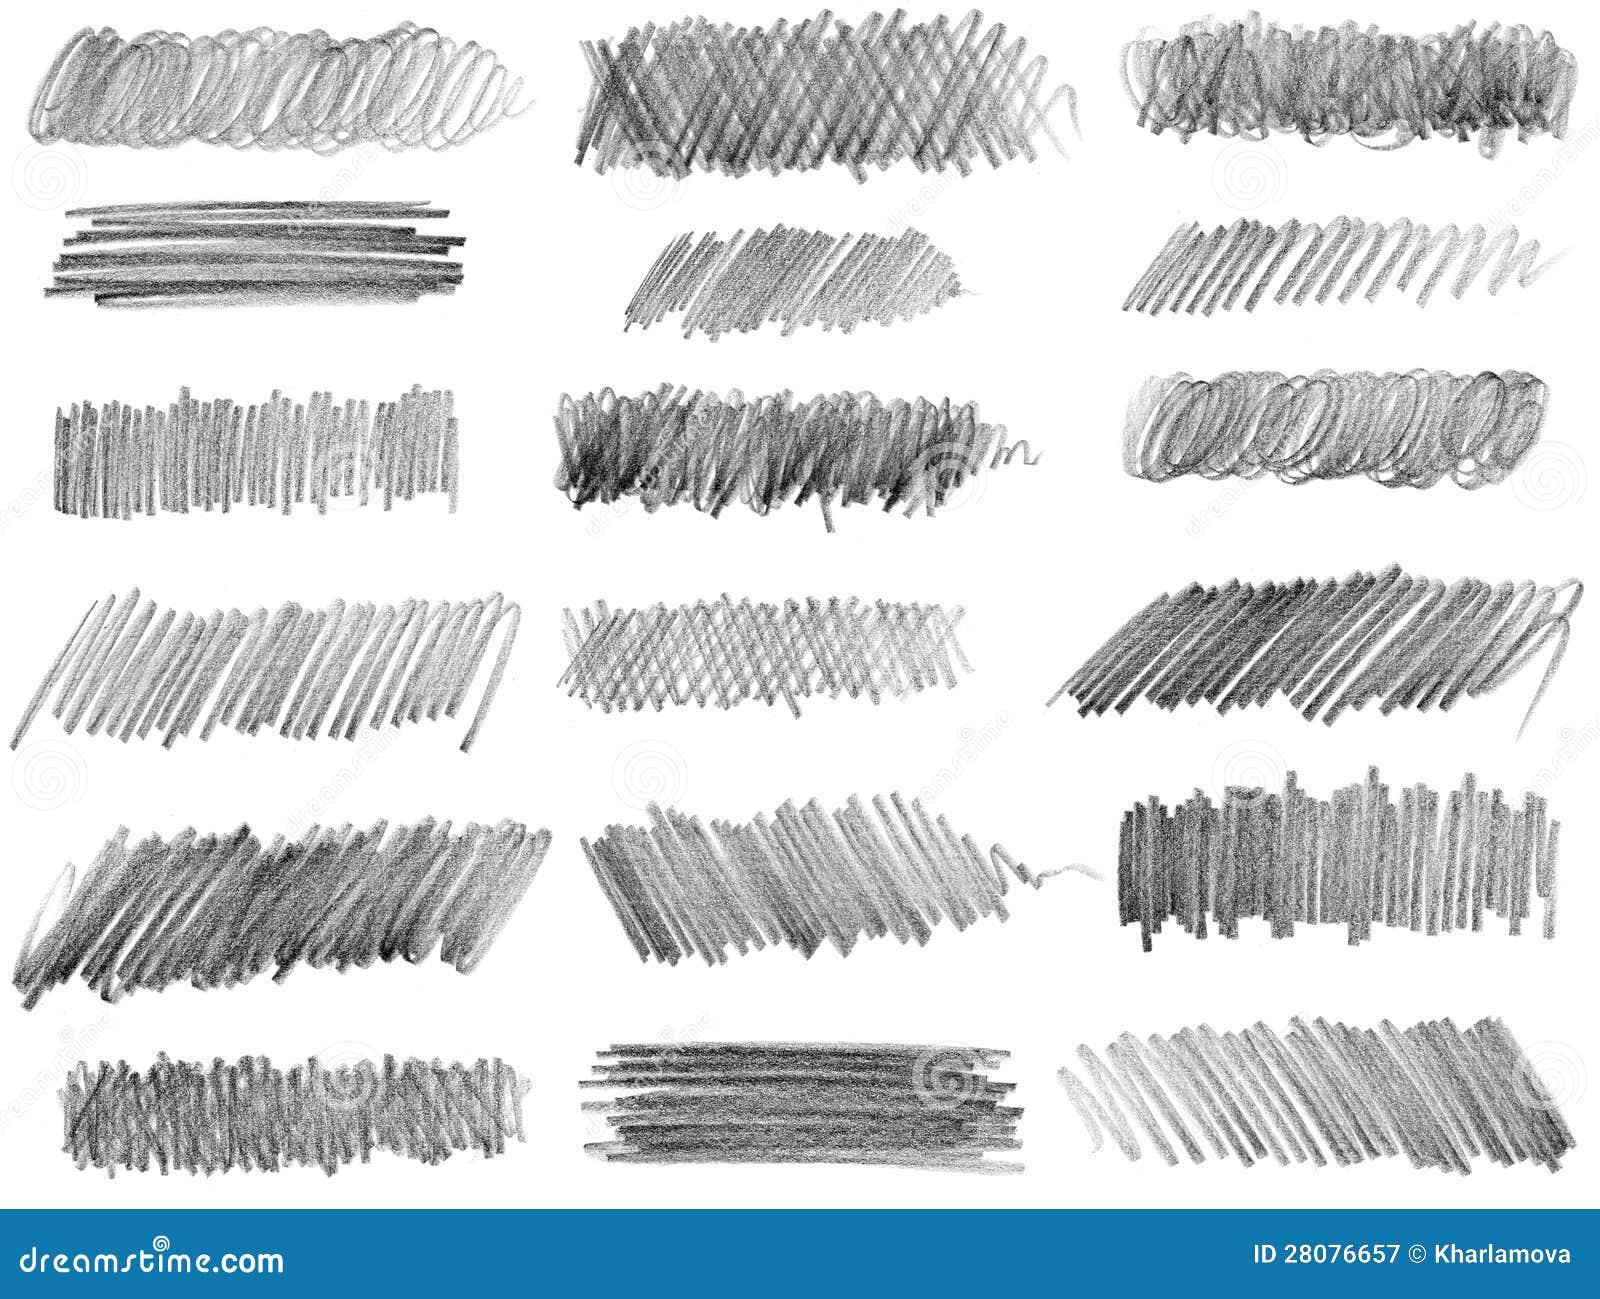 Pencil drawing stock illustration  Illustration of effect